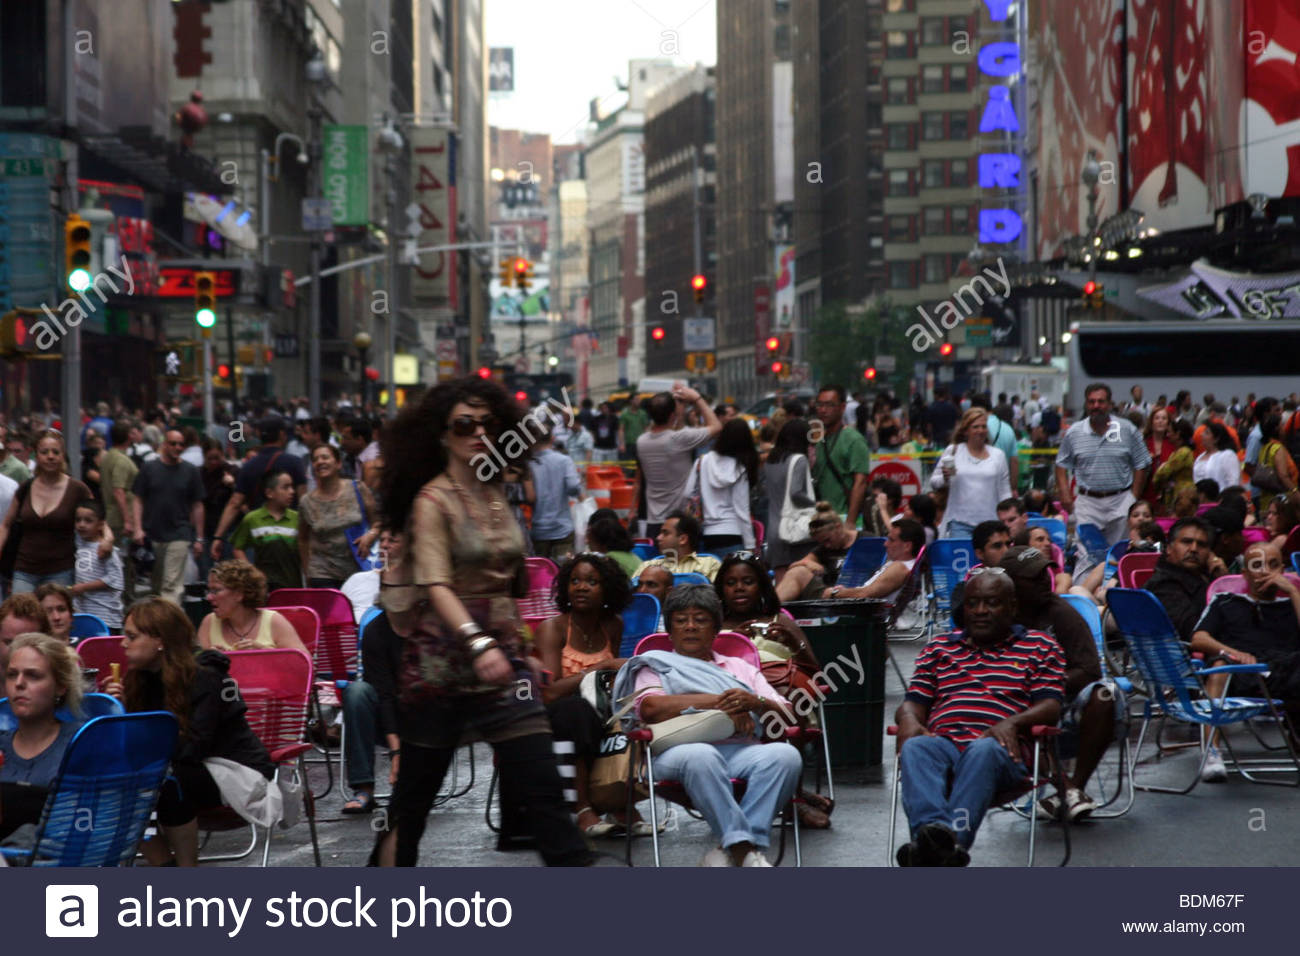 New York, Time Square, NYC, advertising, ads, people, many, USA, America, urban, Manhattan - Stock Image